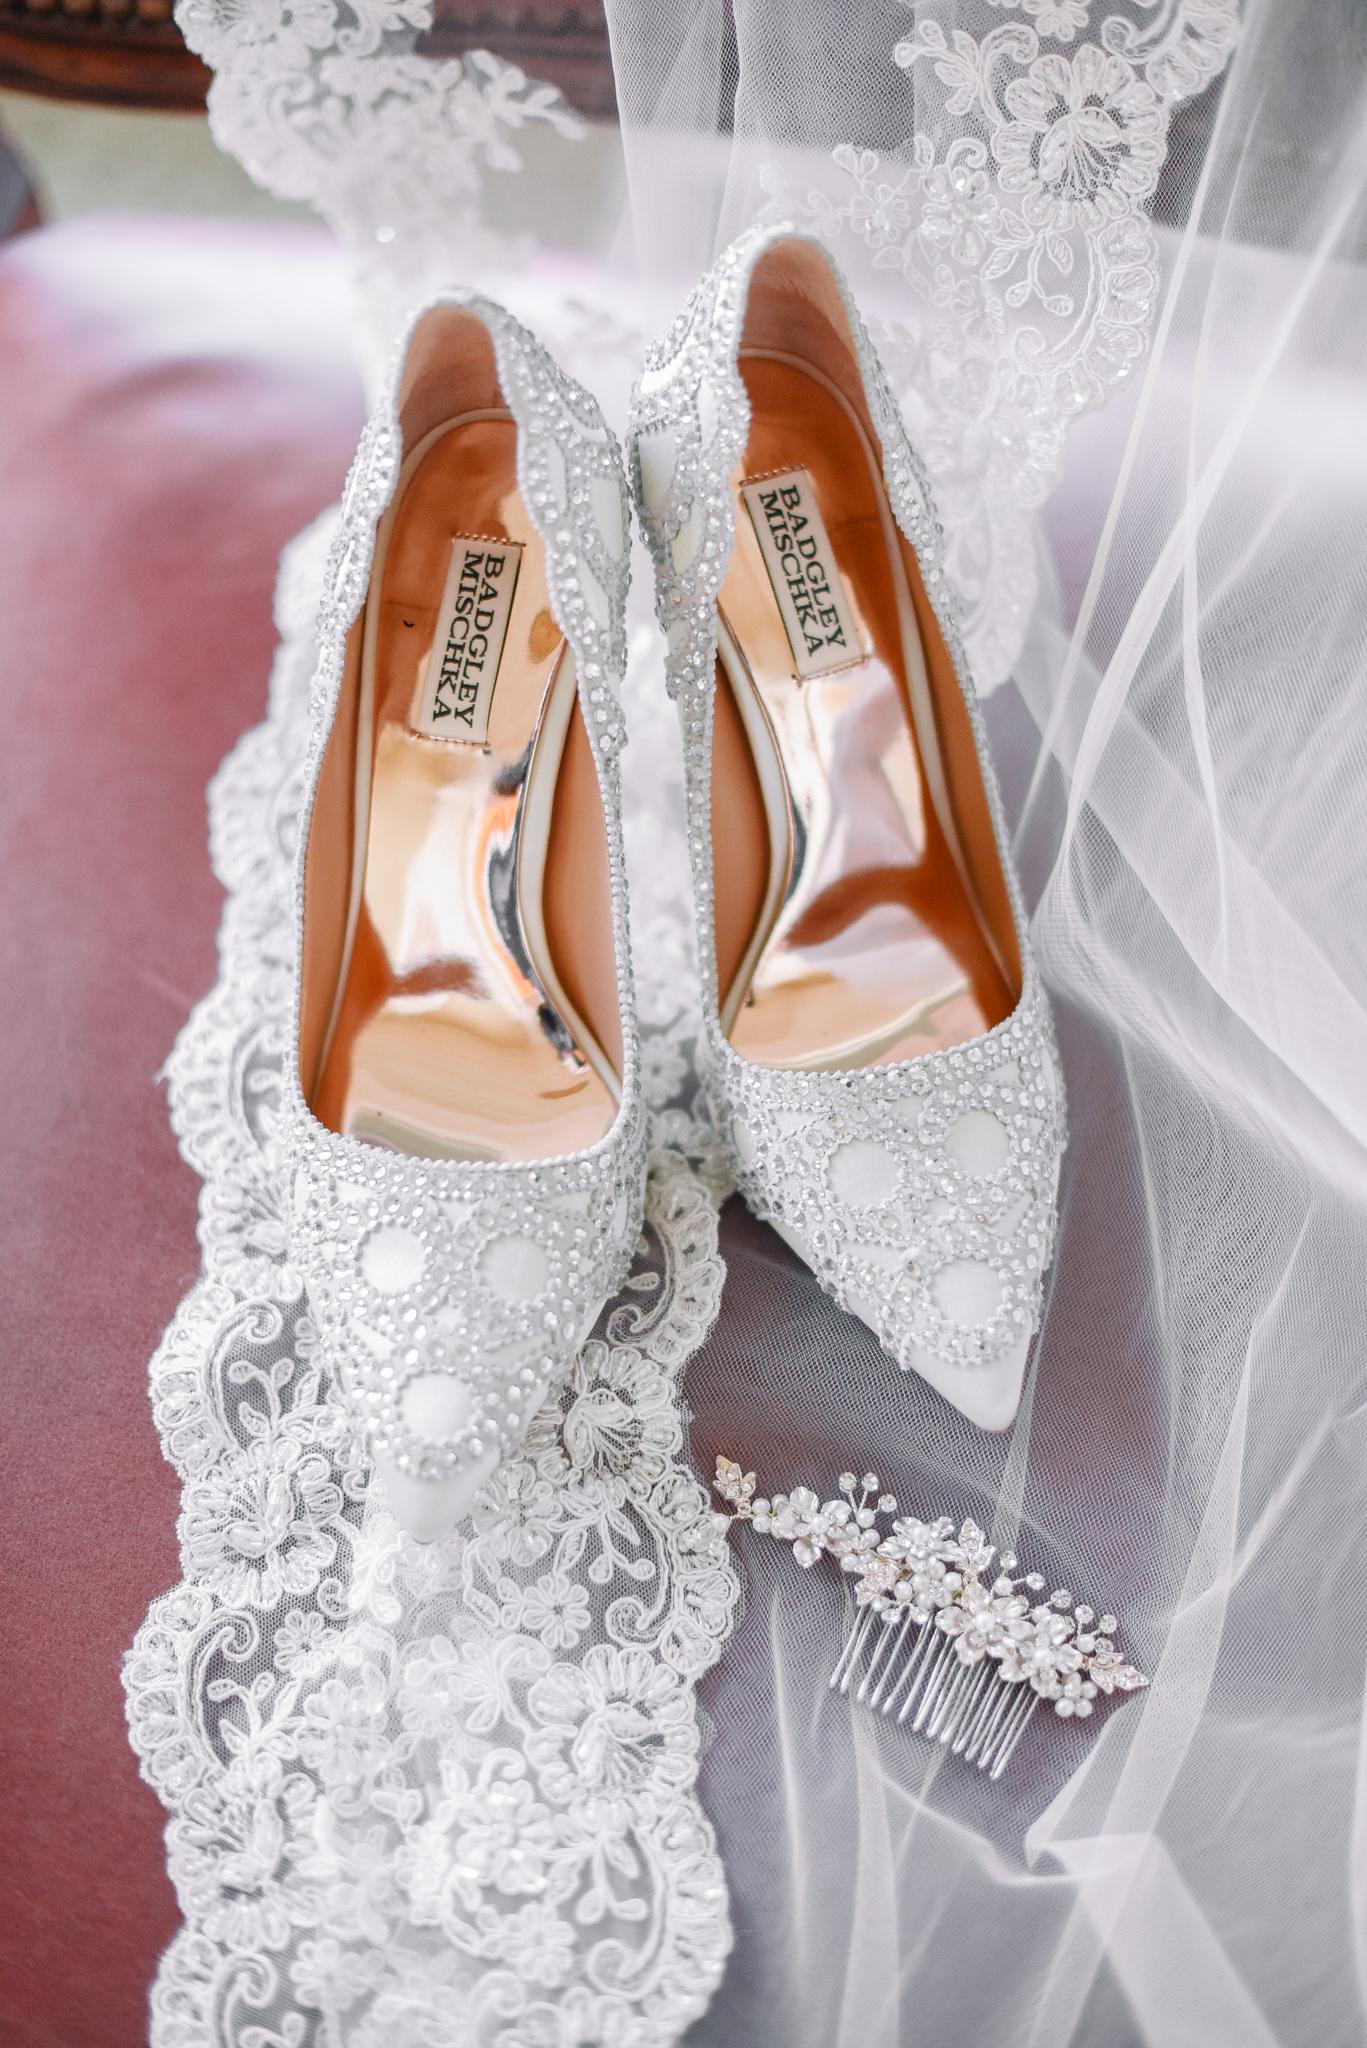 Manu and Laura - Portland Wedding Photographer - 1.jpg